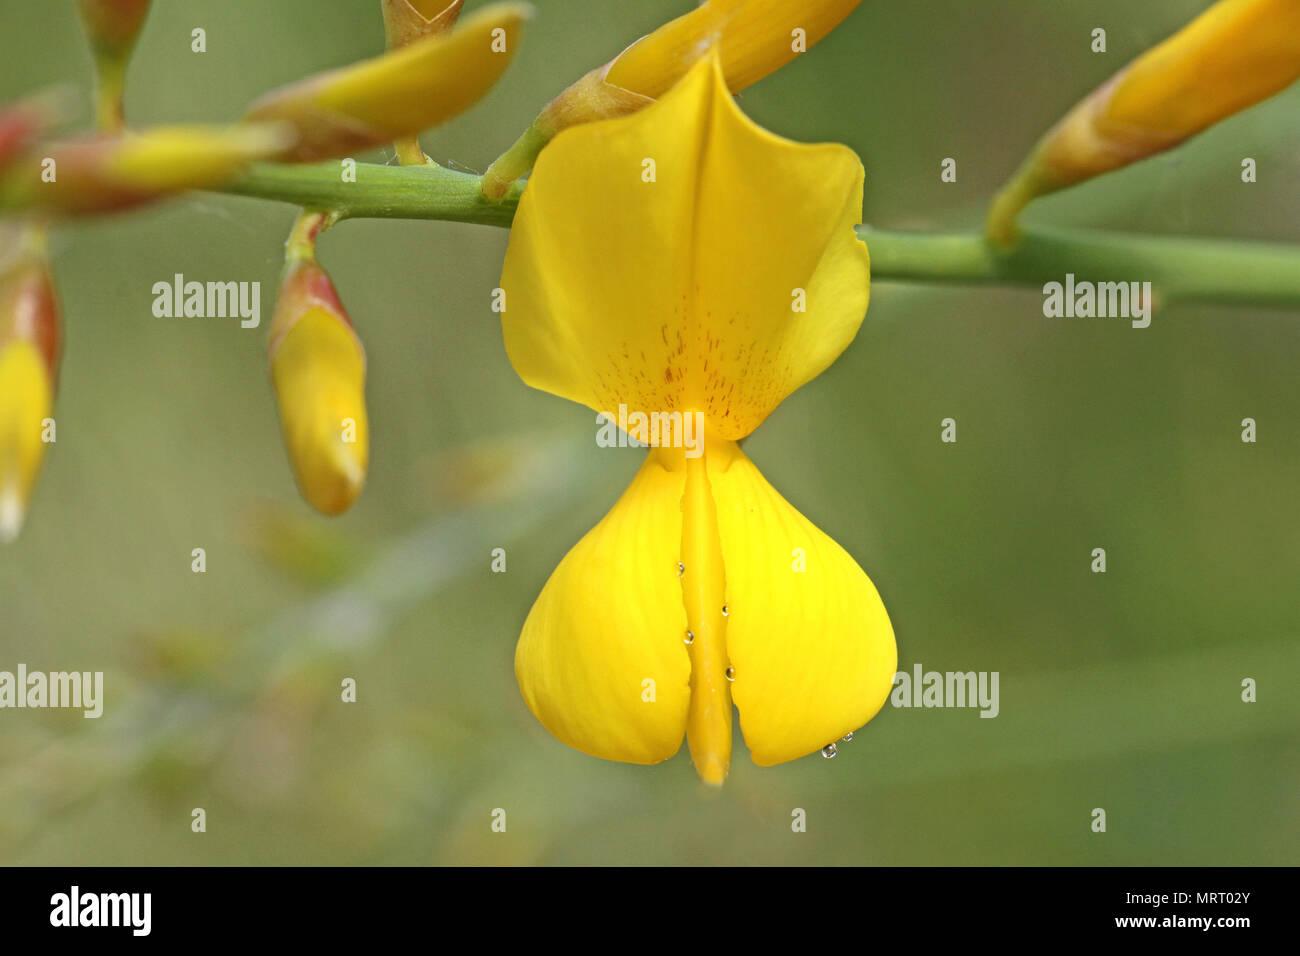 Yellow broom flower stock photos yellow broom flower stock images yellow broom or ginsestra flower latin name ginesta cinerea not cytisus scoparius or spachianus in spring mightylinksfo